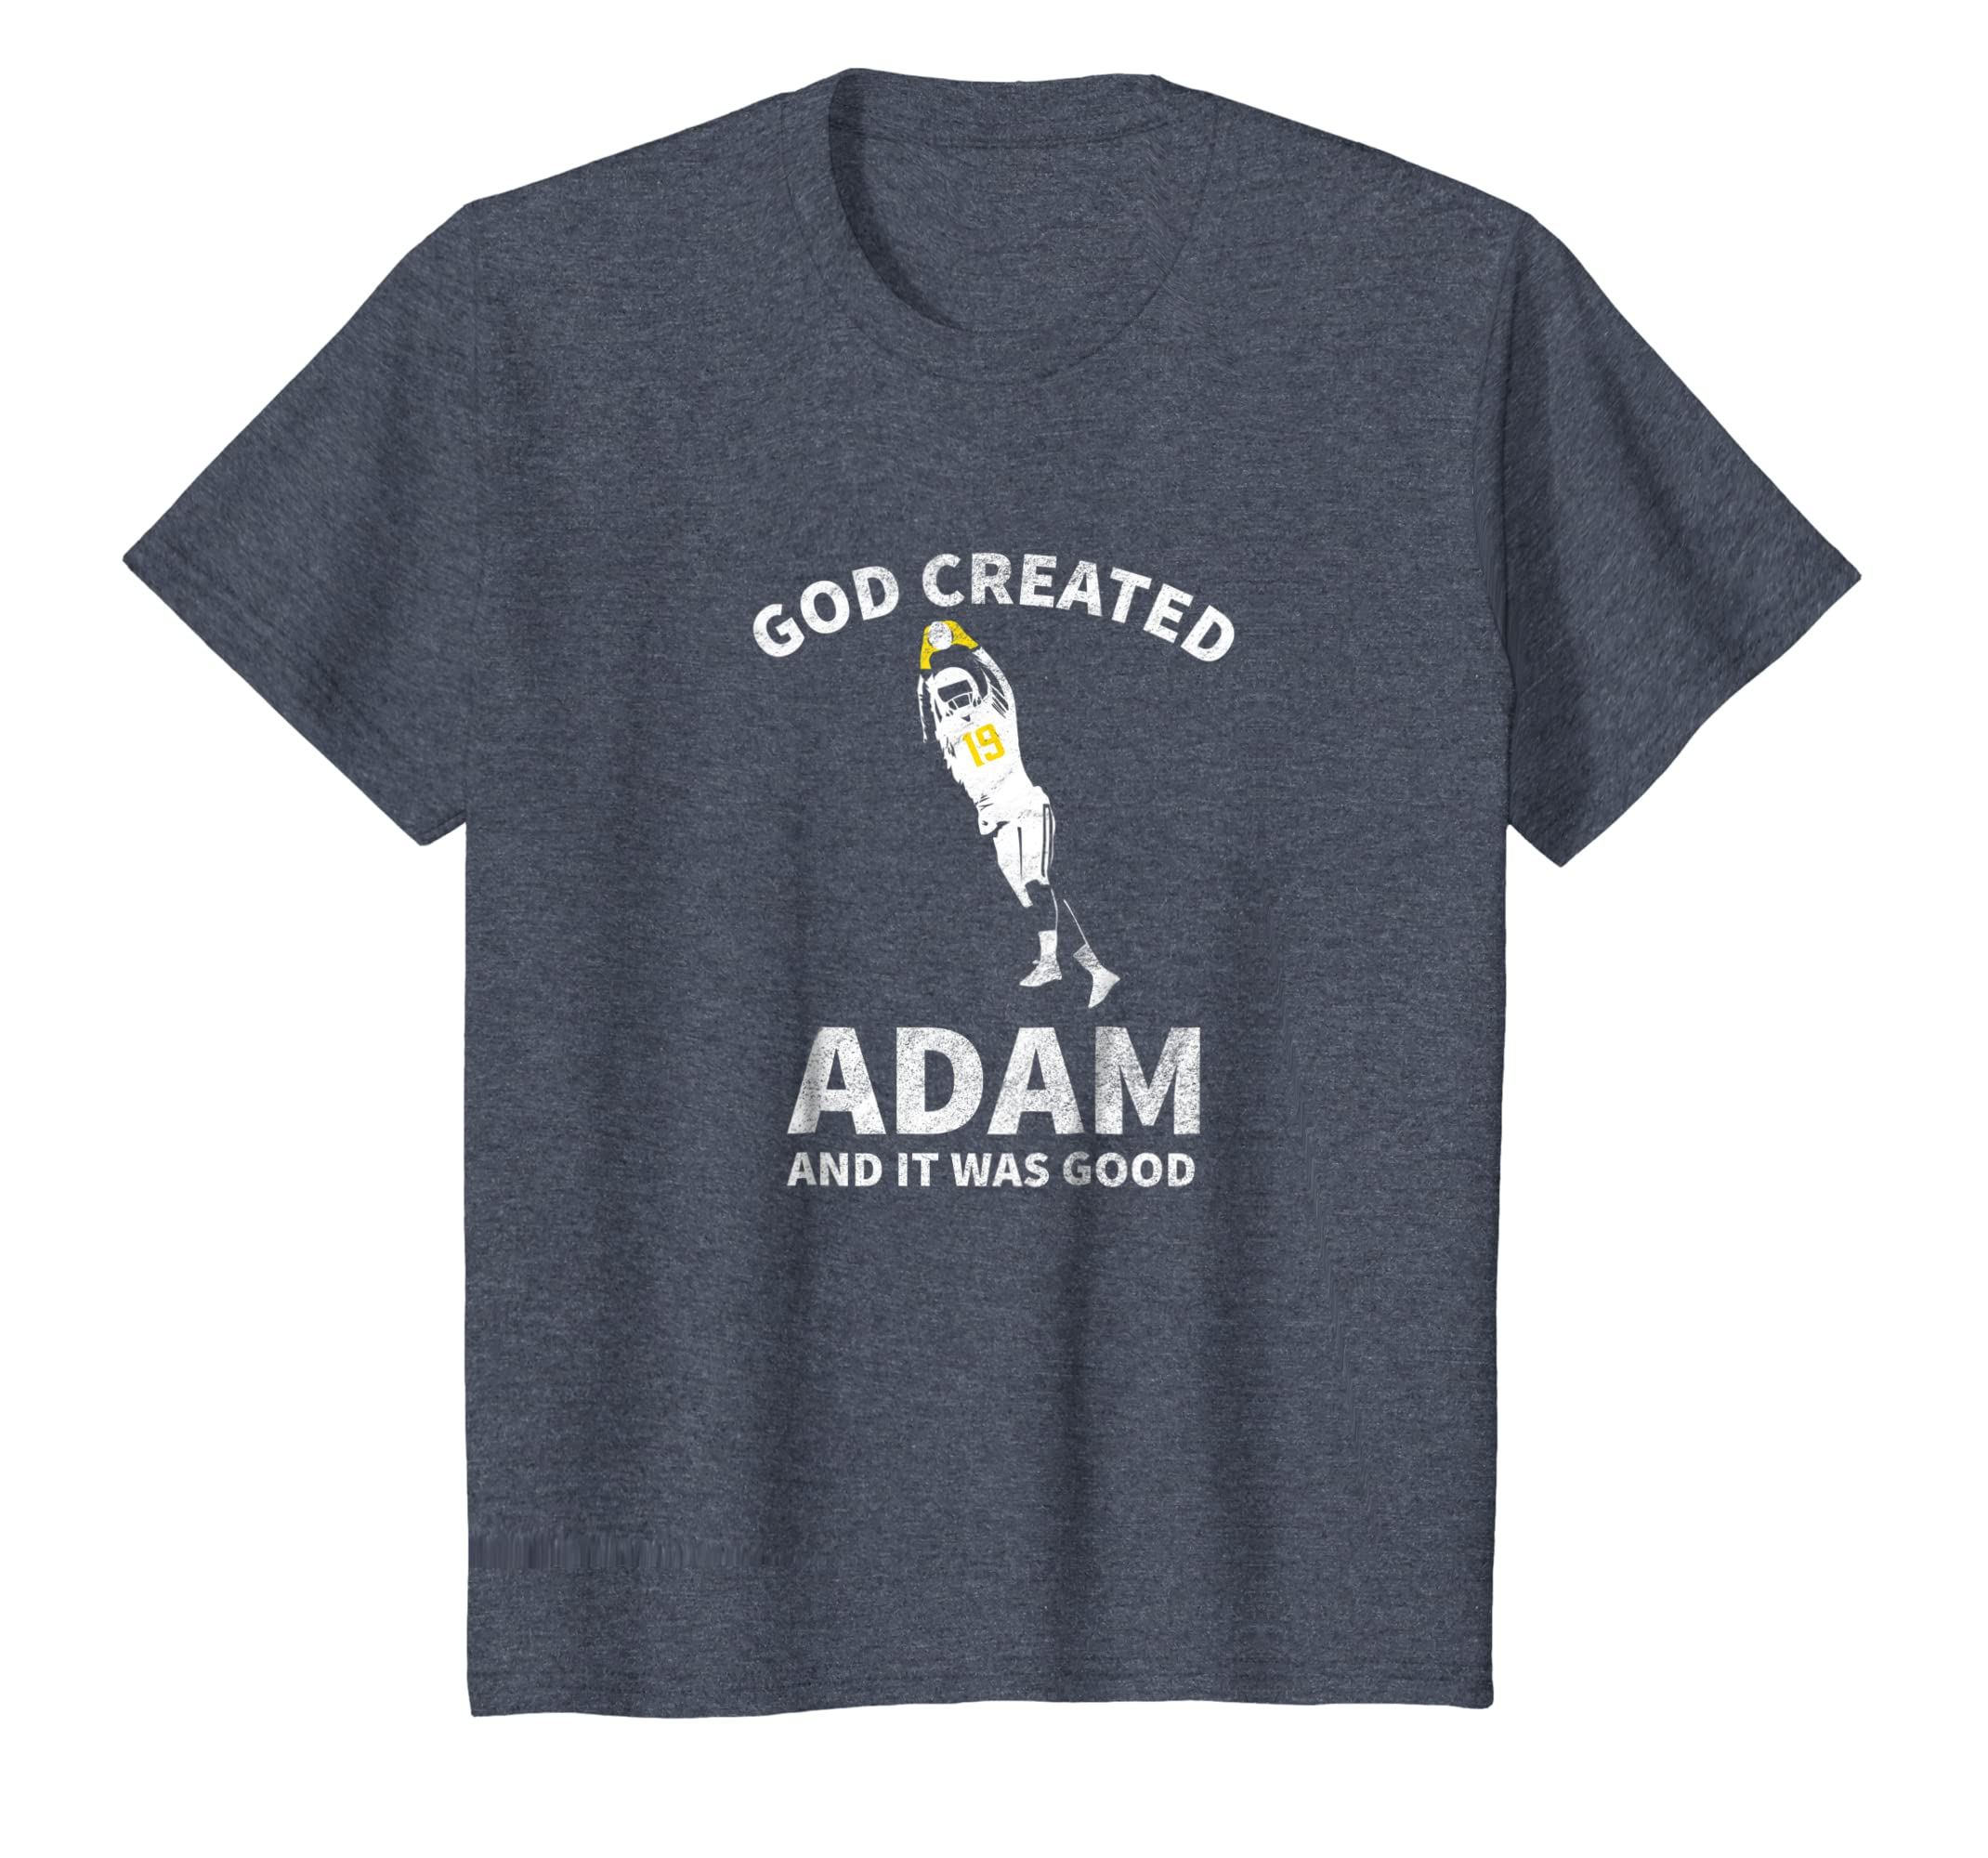 f5bf4bc7 Amazon.com: Retro Distressed God and Adam Football Gift Tee: Clothing